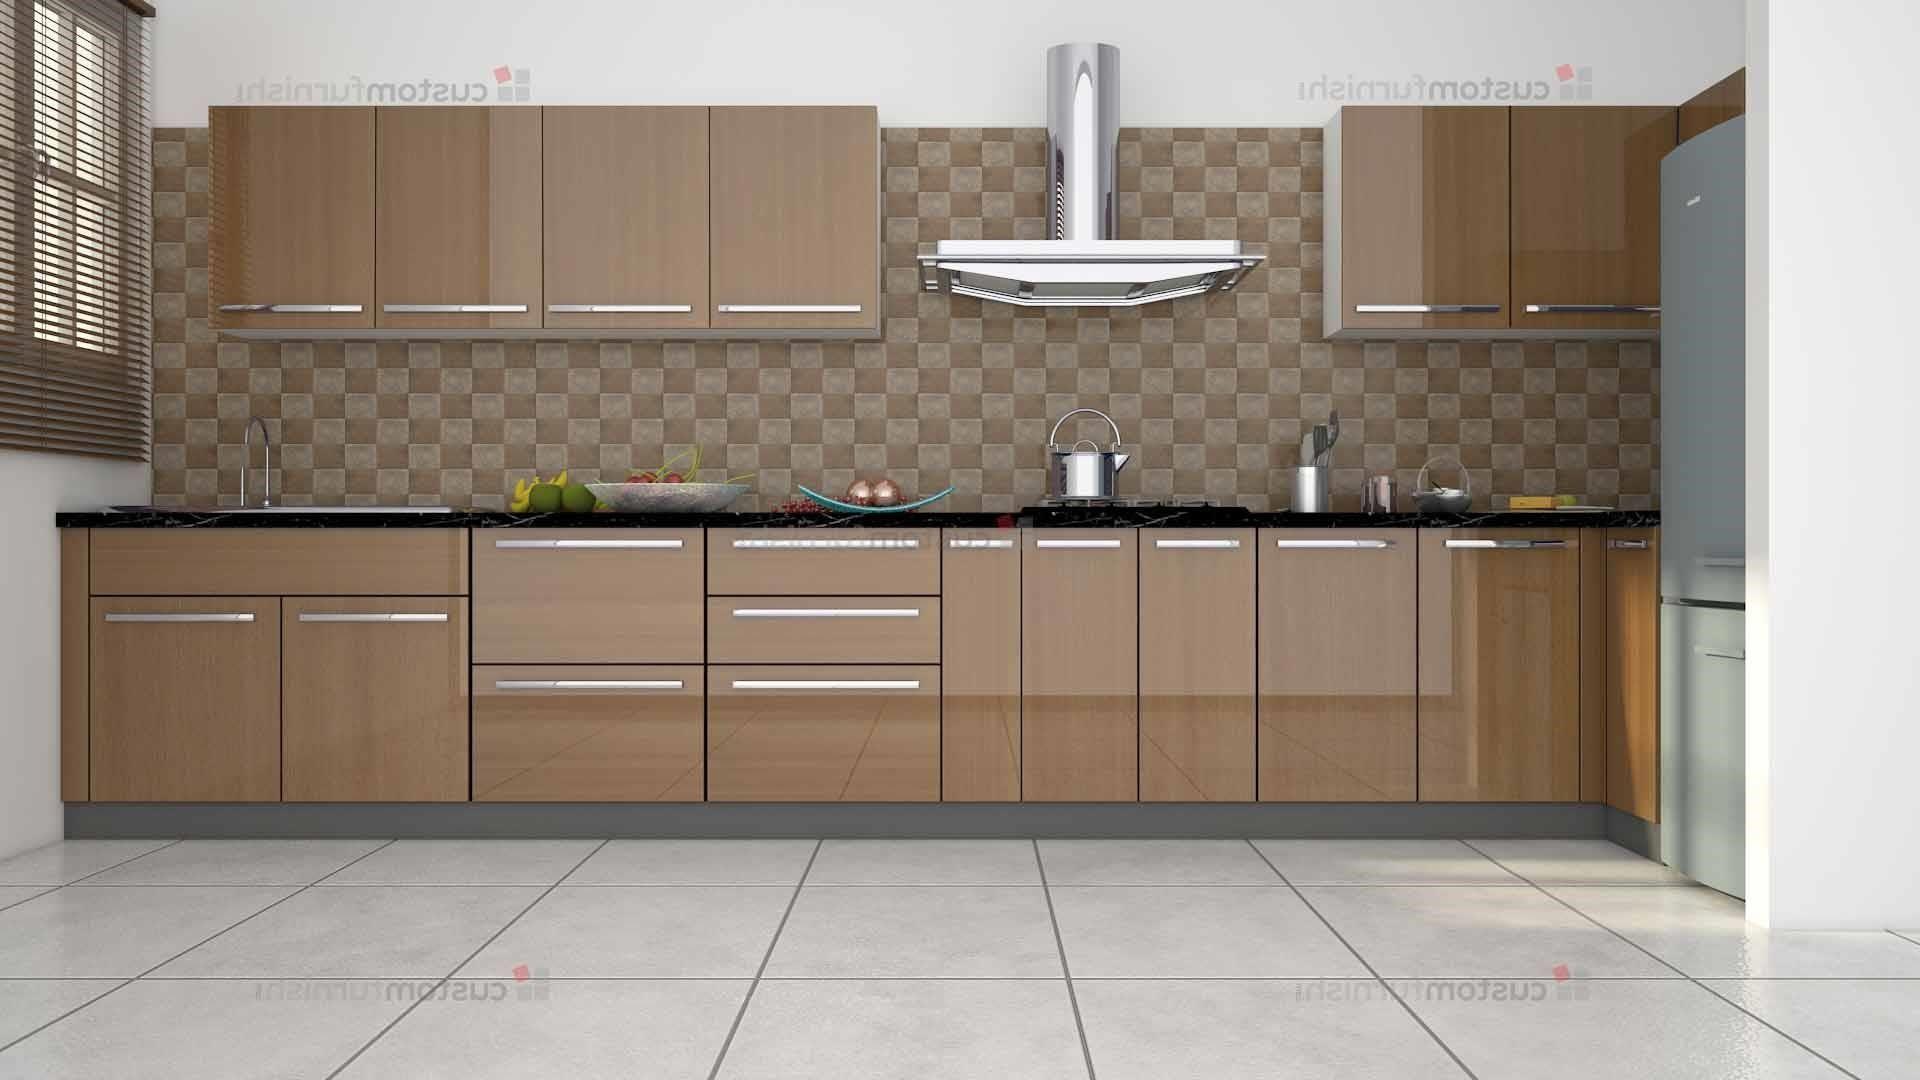 L Shaped Modular Kitchen Designs Catalogue Jpg 1 920 1 080 Pixels